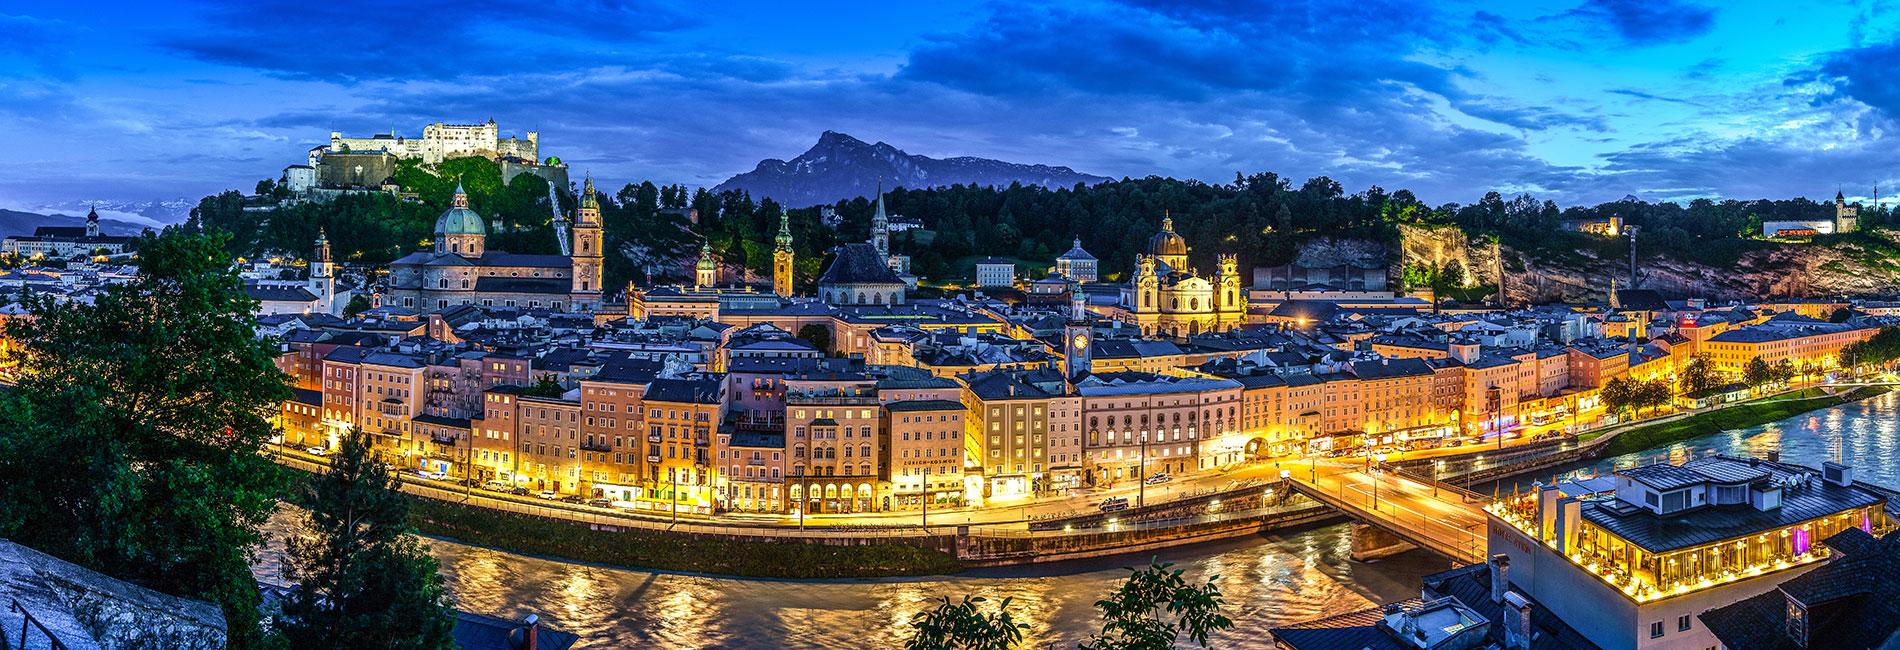 Salzburg Guide Tourismus - Nachtpanorama